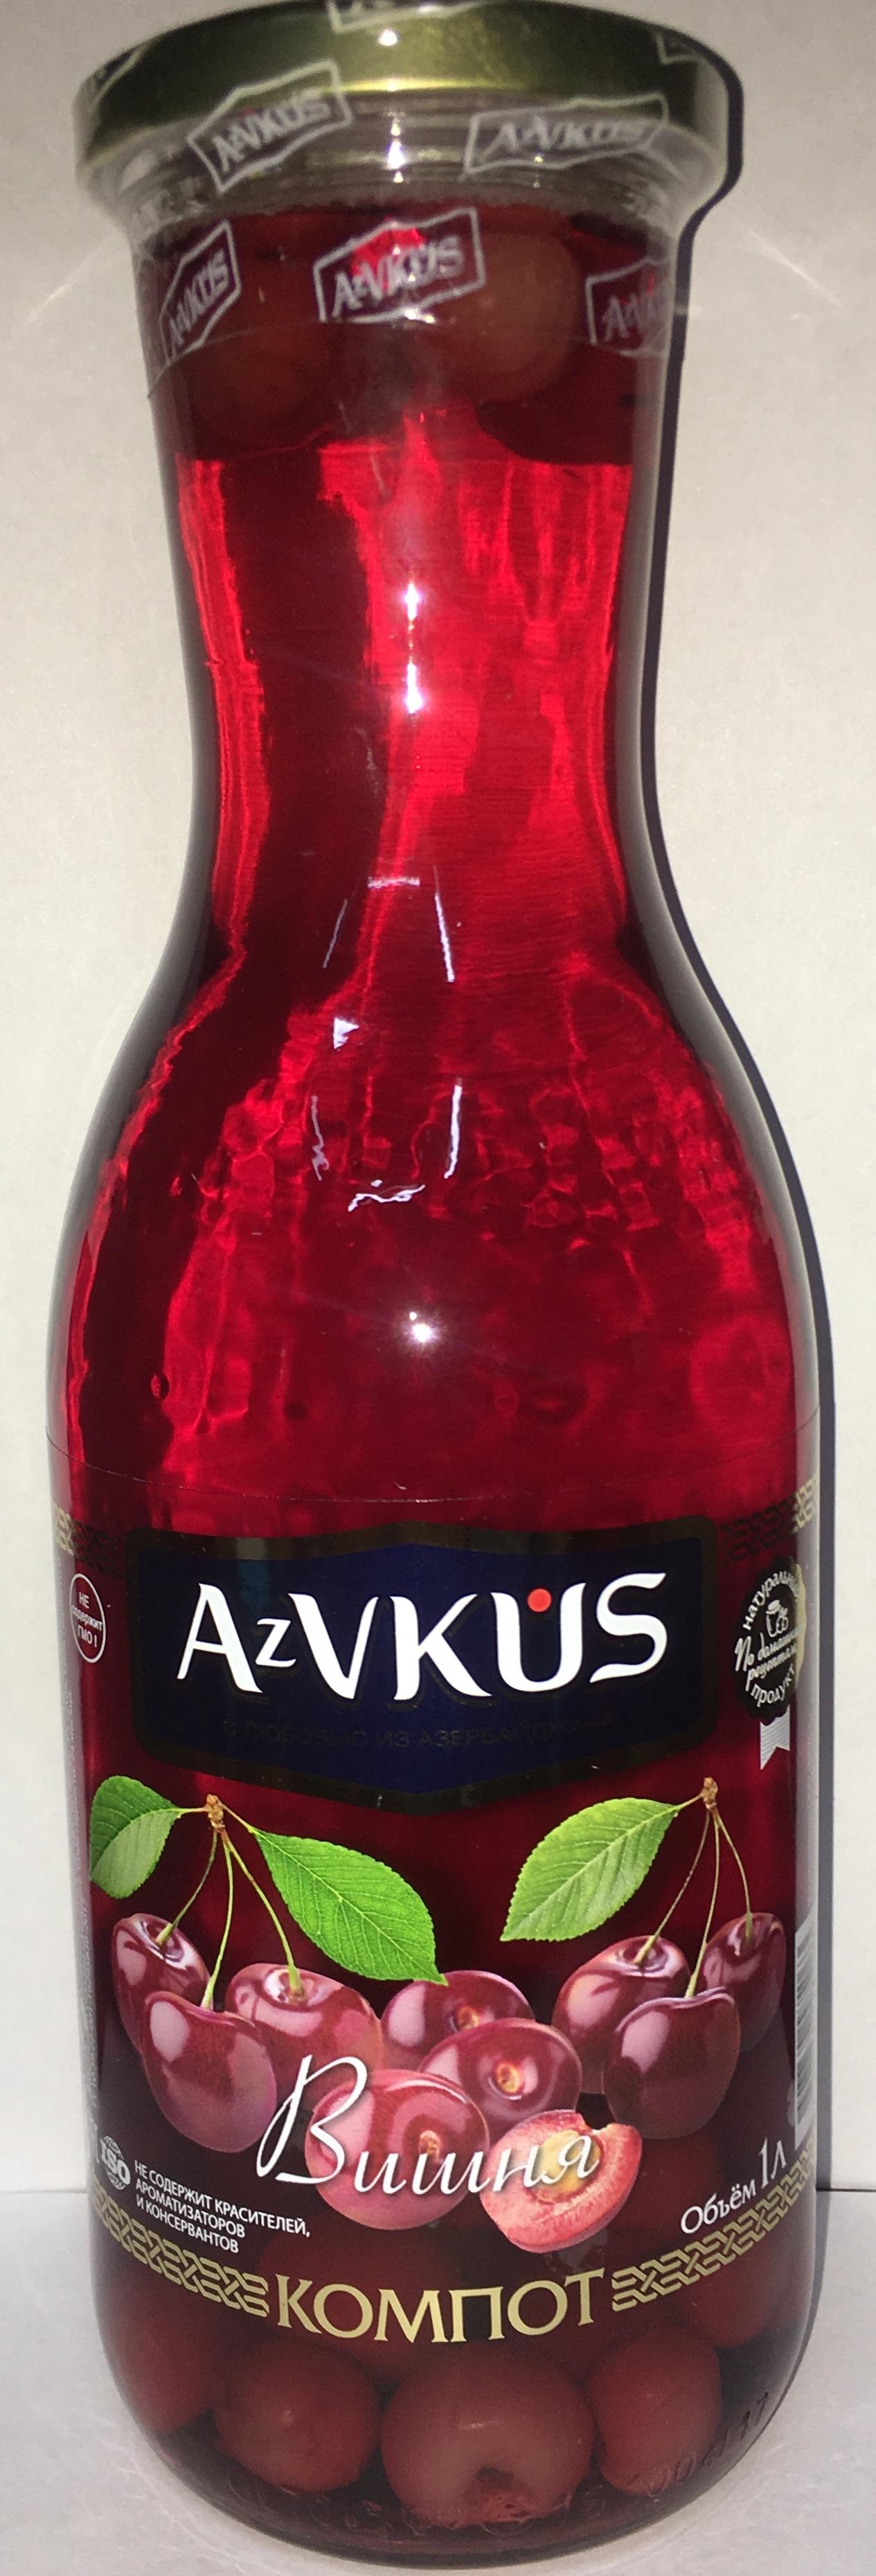 AZVKUS из вишни 1л azvkus из фейхоа 1л